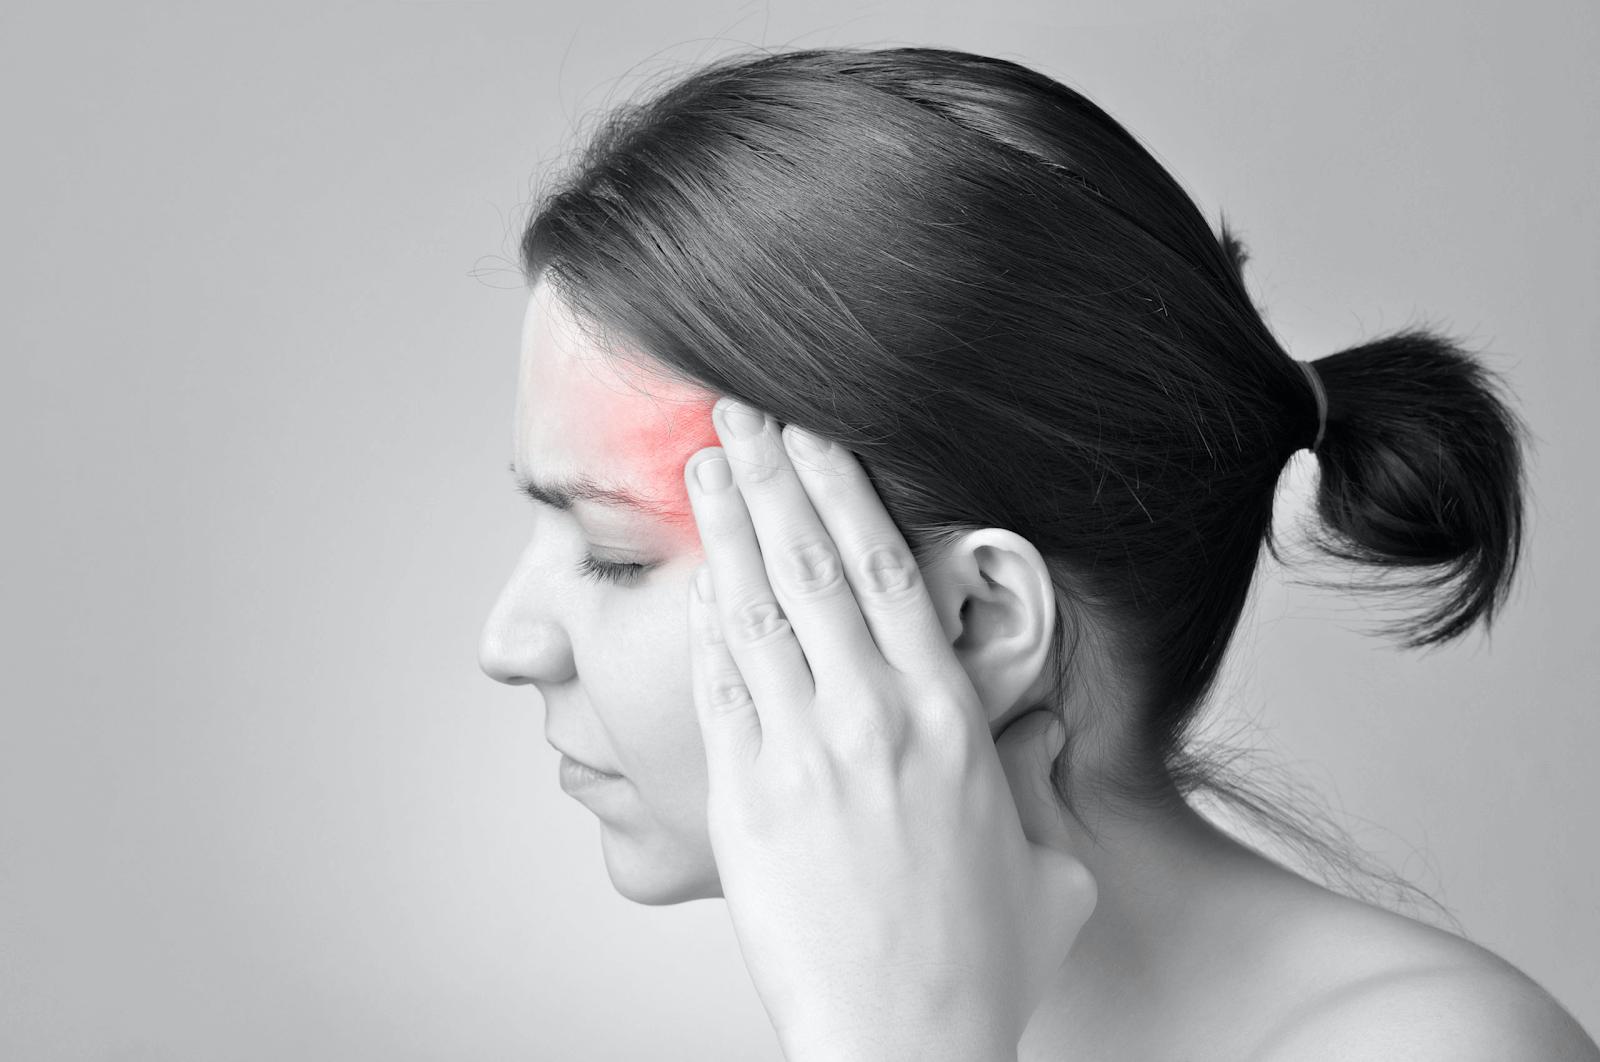 A black and white picture highlighting a woman's throbbing headache.